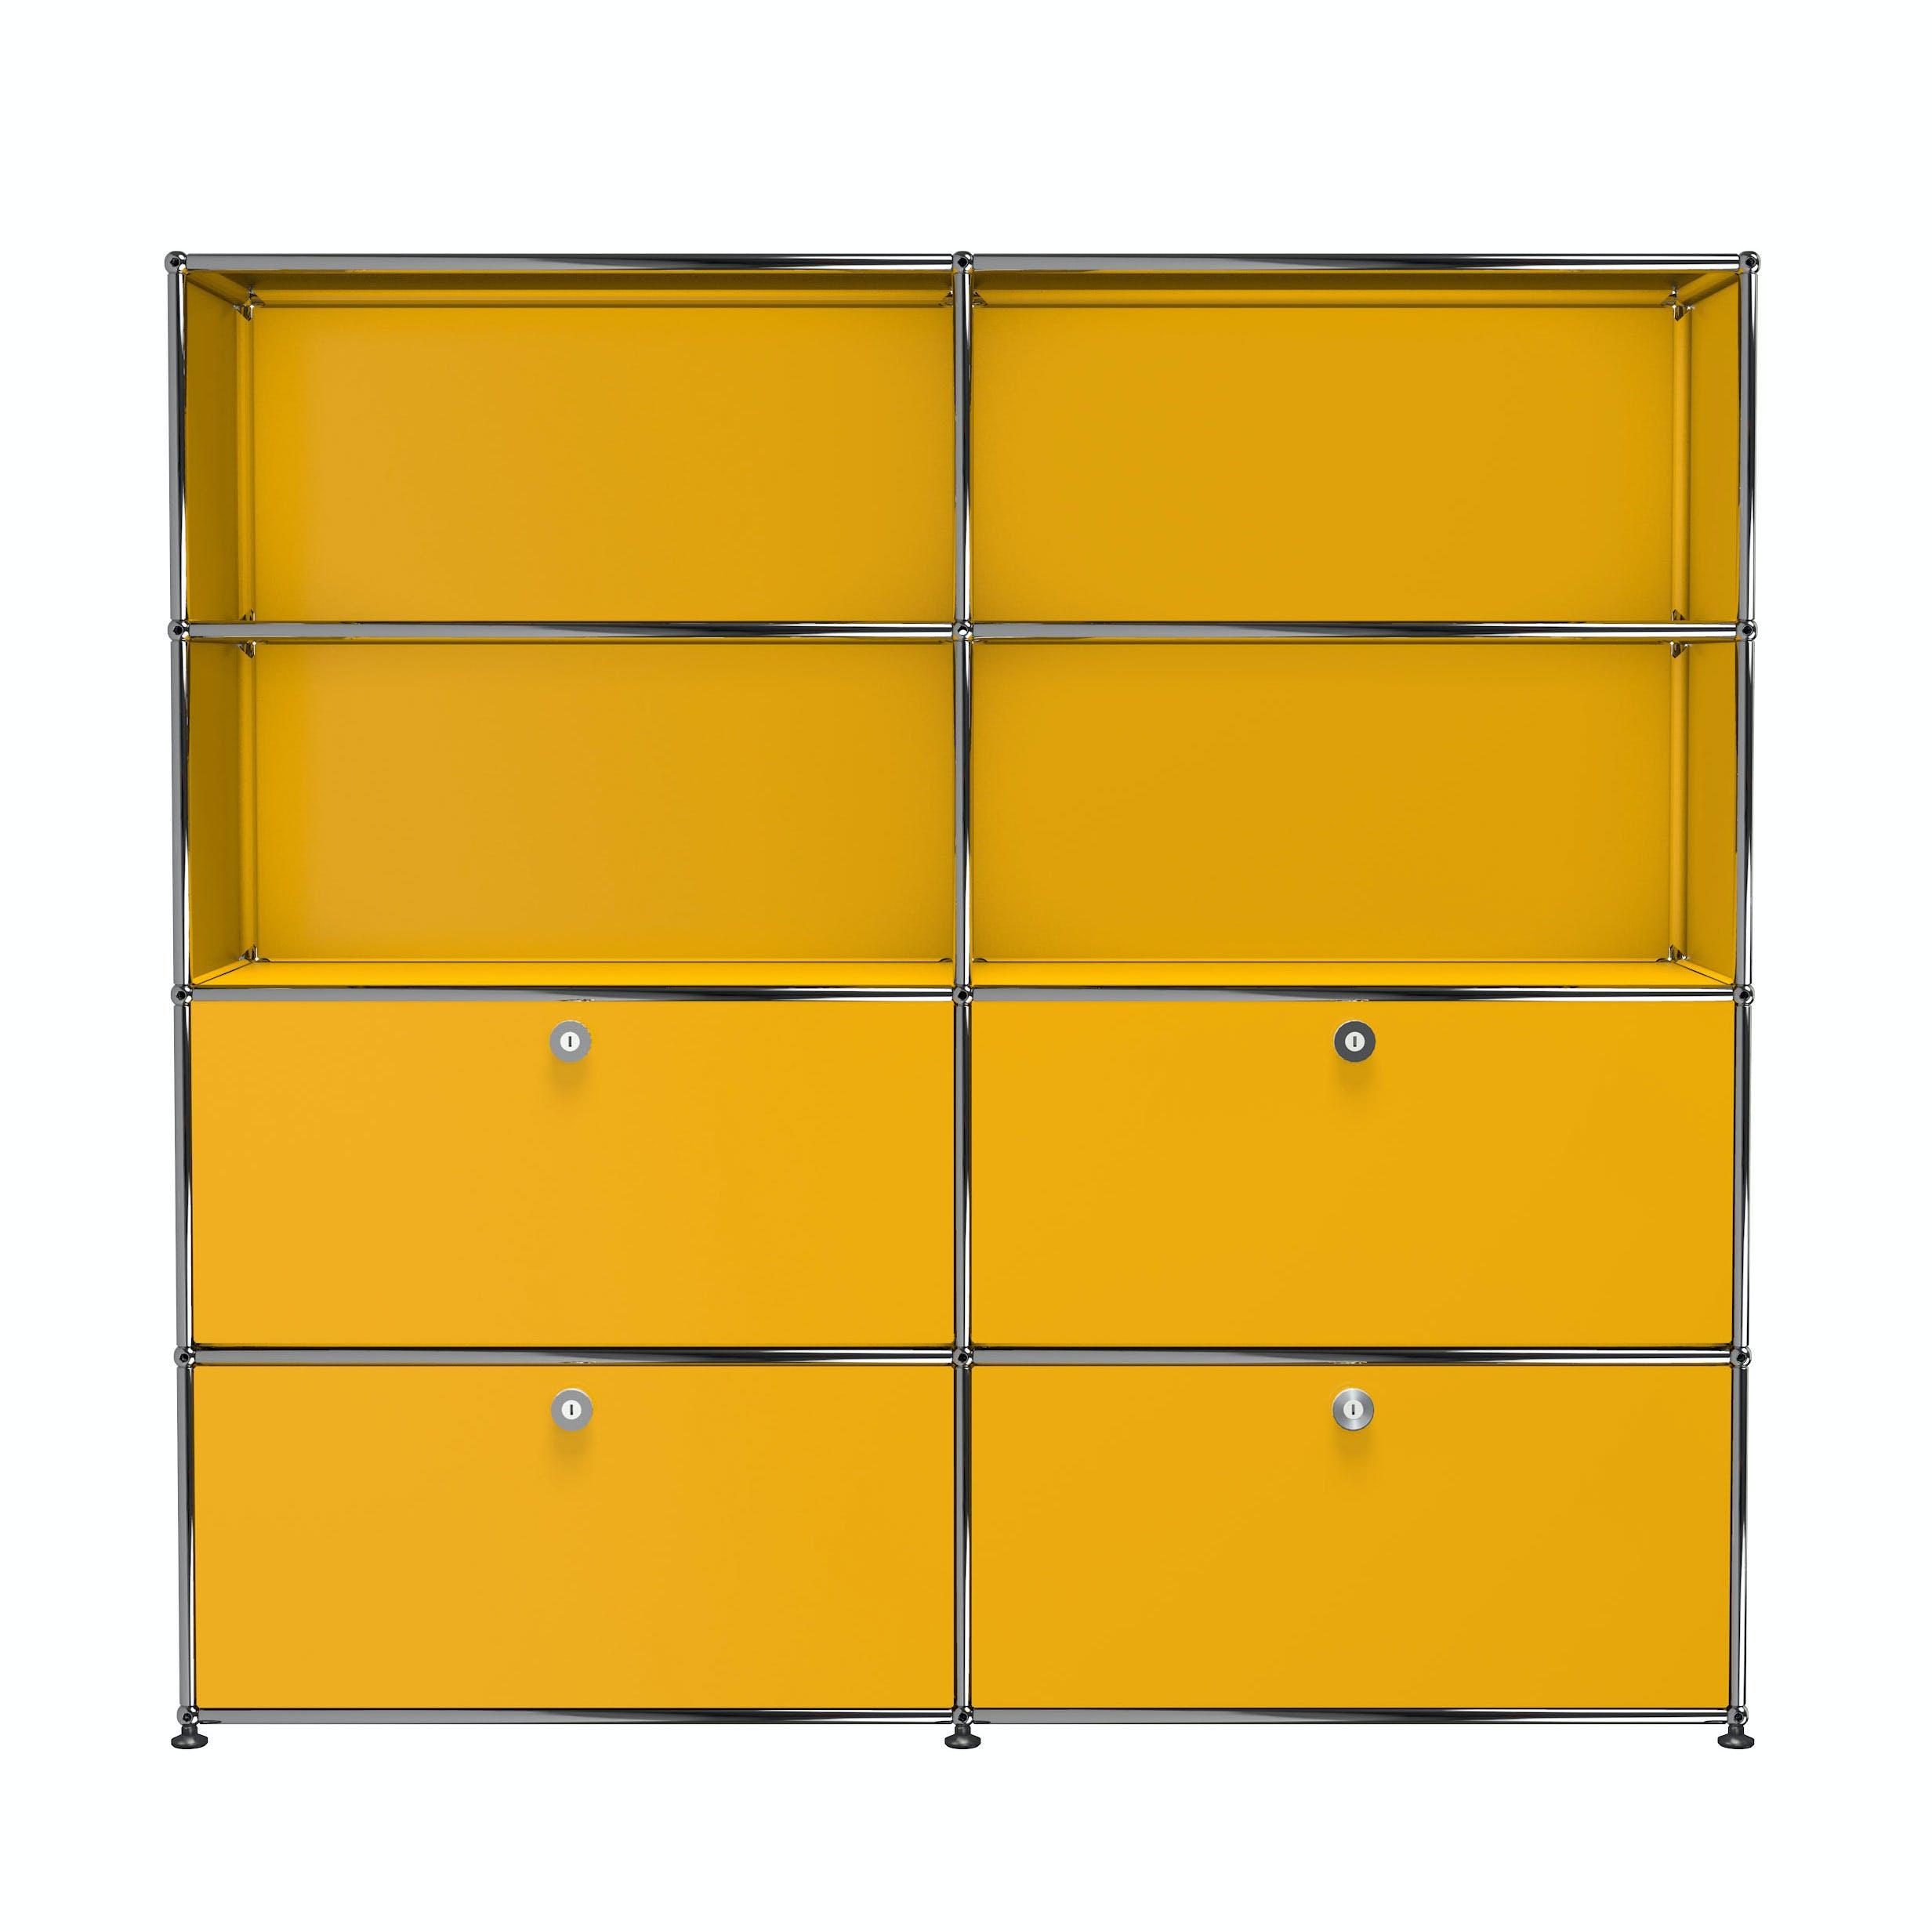 Usm-quick-ship-Haller-Storage-S2-yellow-haute-living